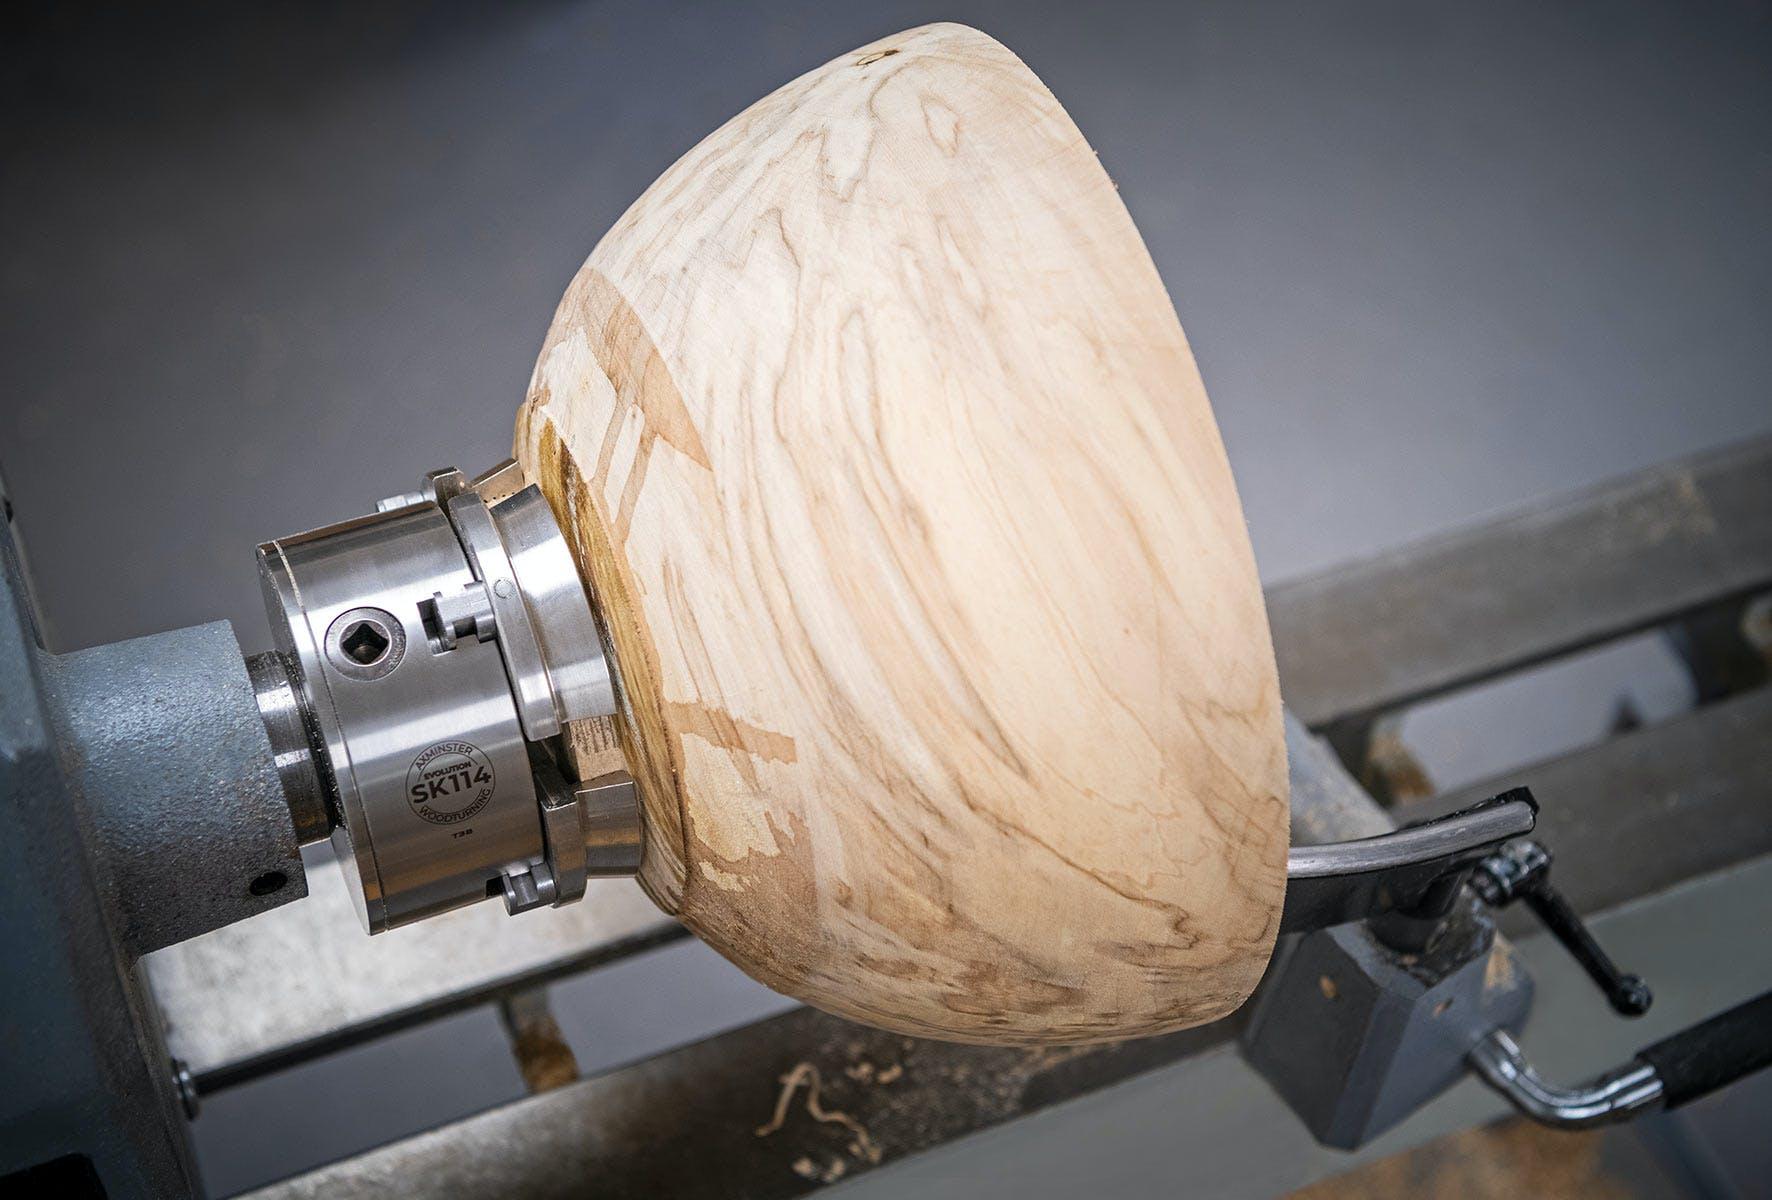 Evolution SK114 Woodturning Chuck